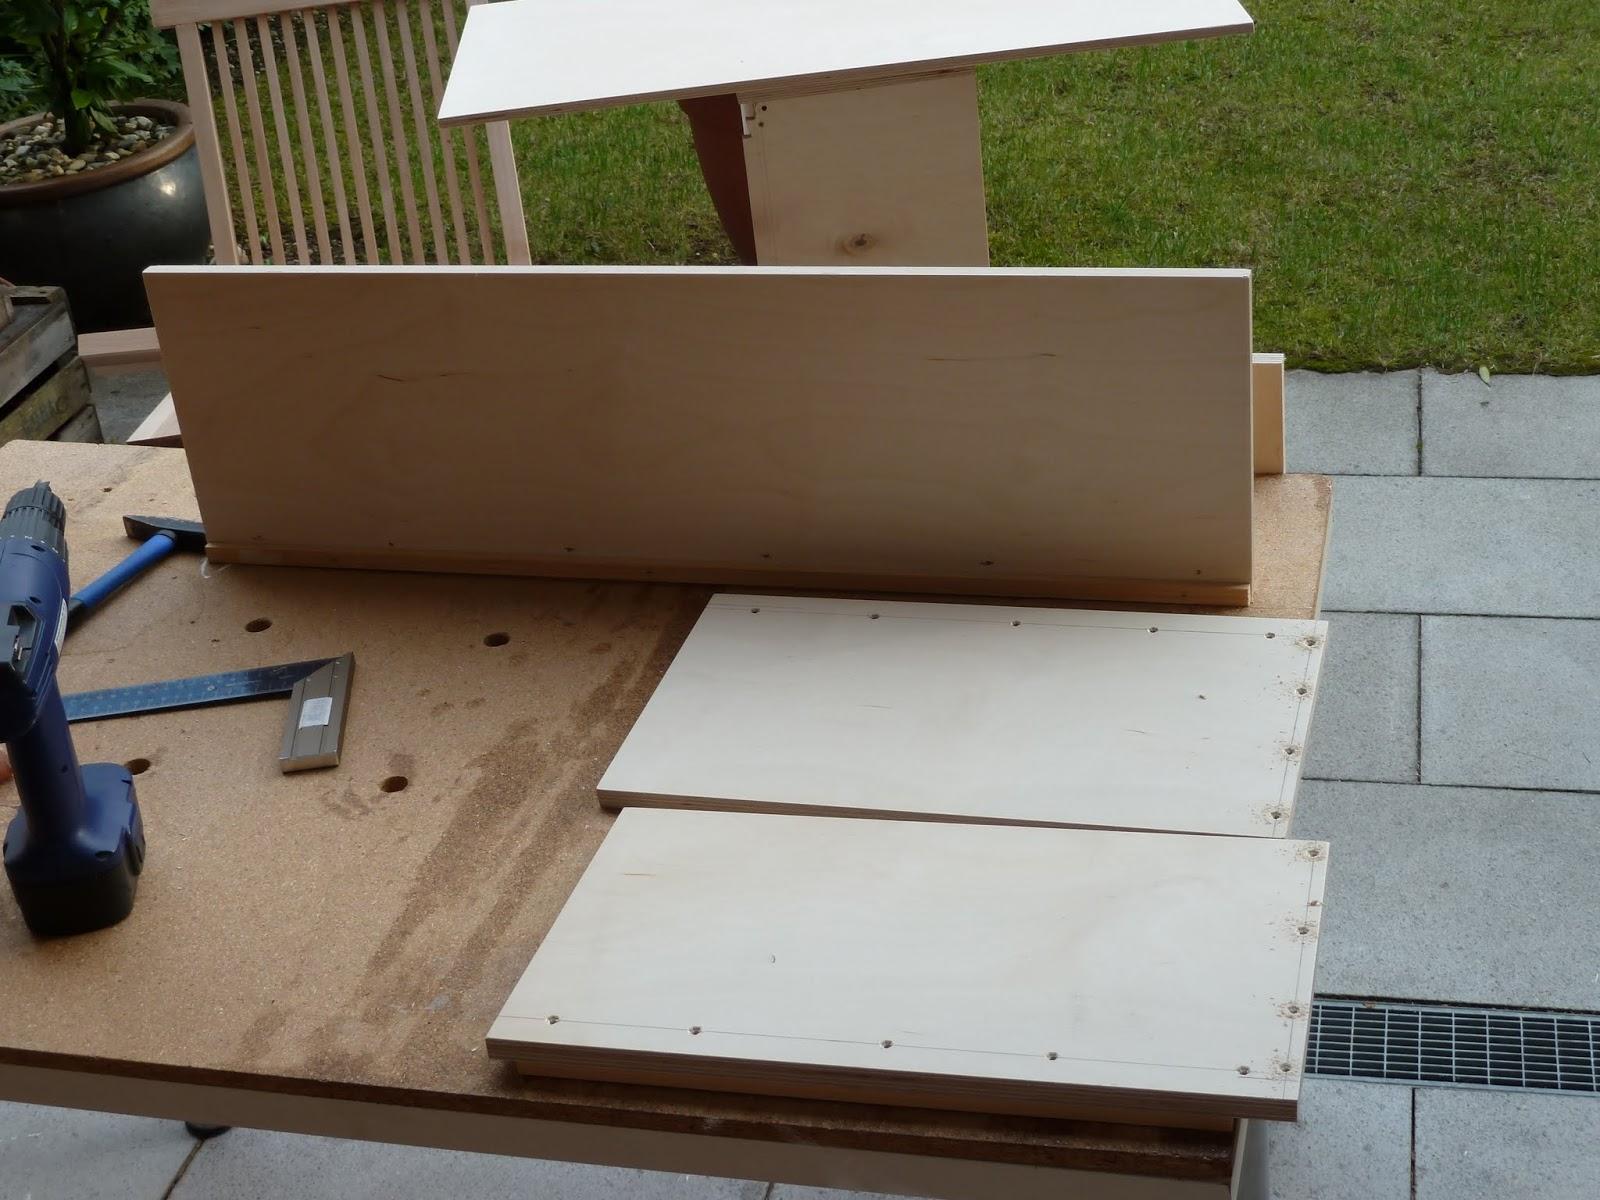 badewanne selber bauen simple badewanne sofa selber mbel. Black Bedroom Furniture Sets. Home Design Ideas